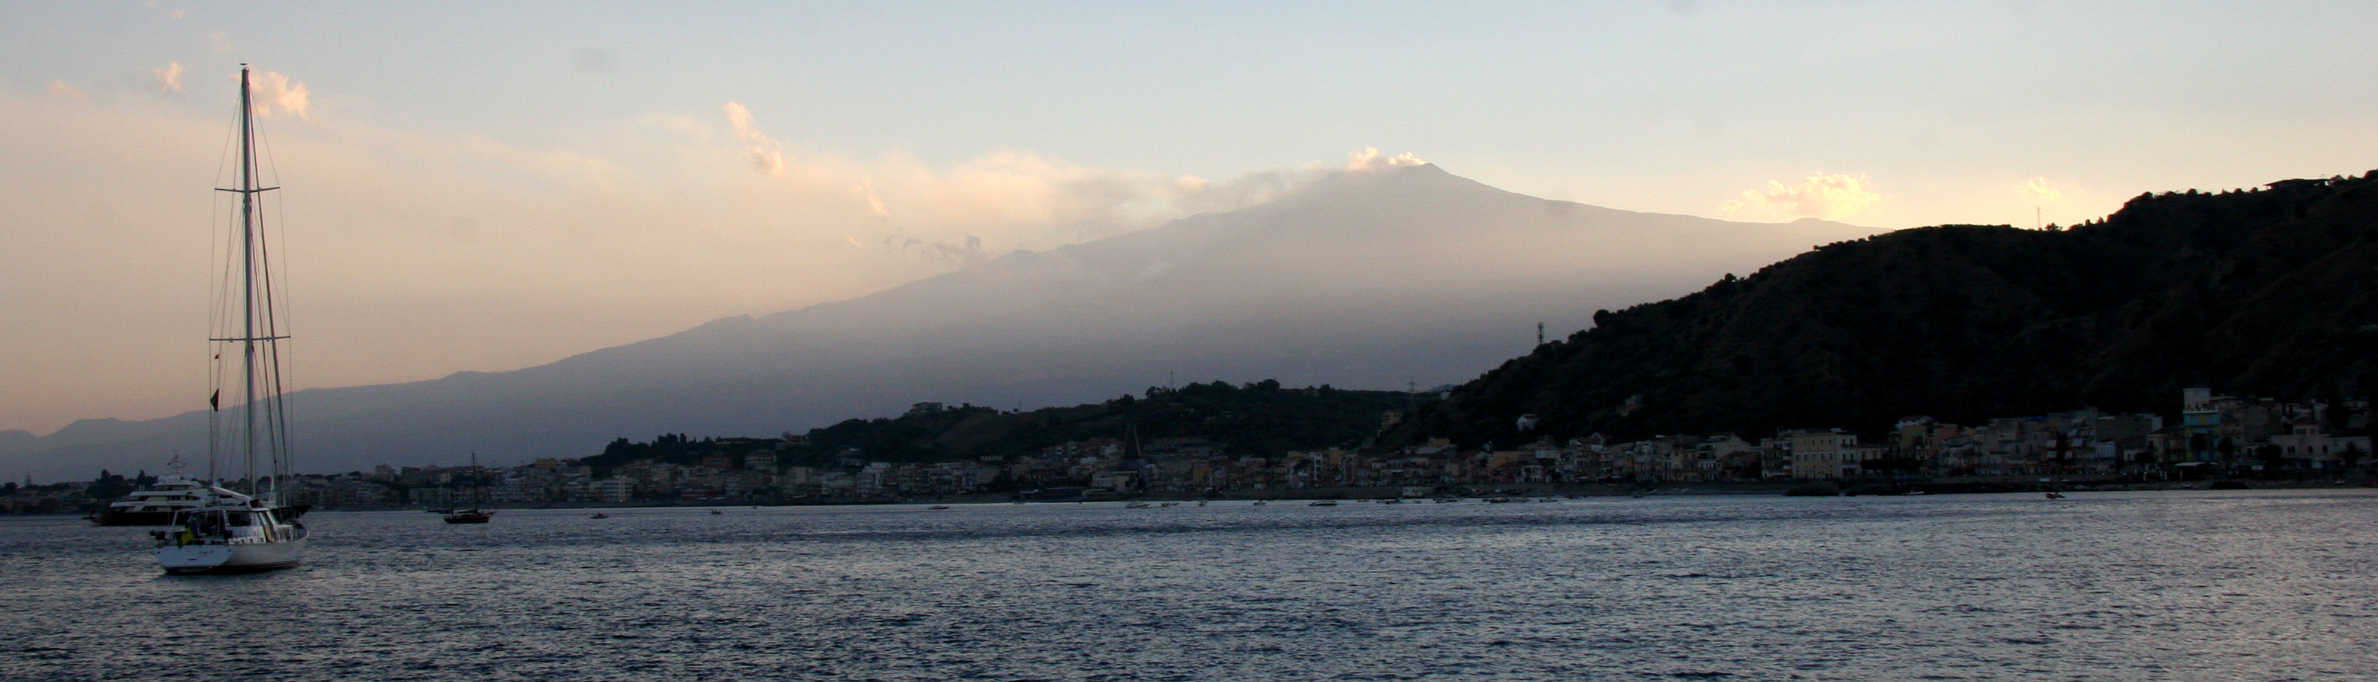 MV #4.2 - Messina - Ionian 072.jpg